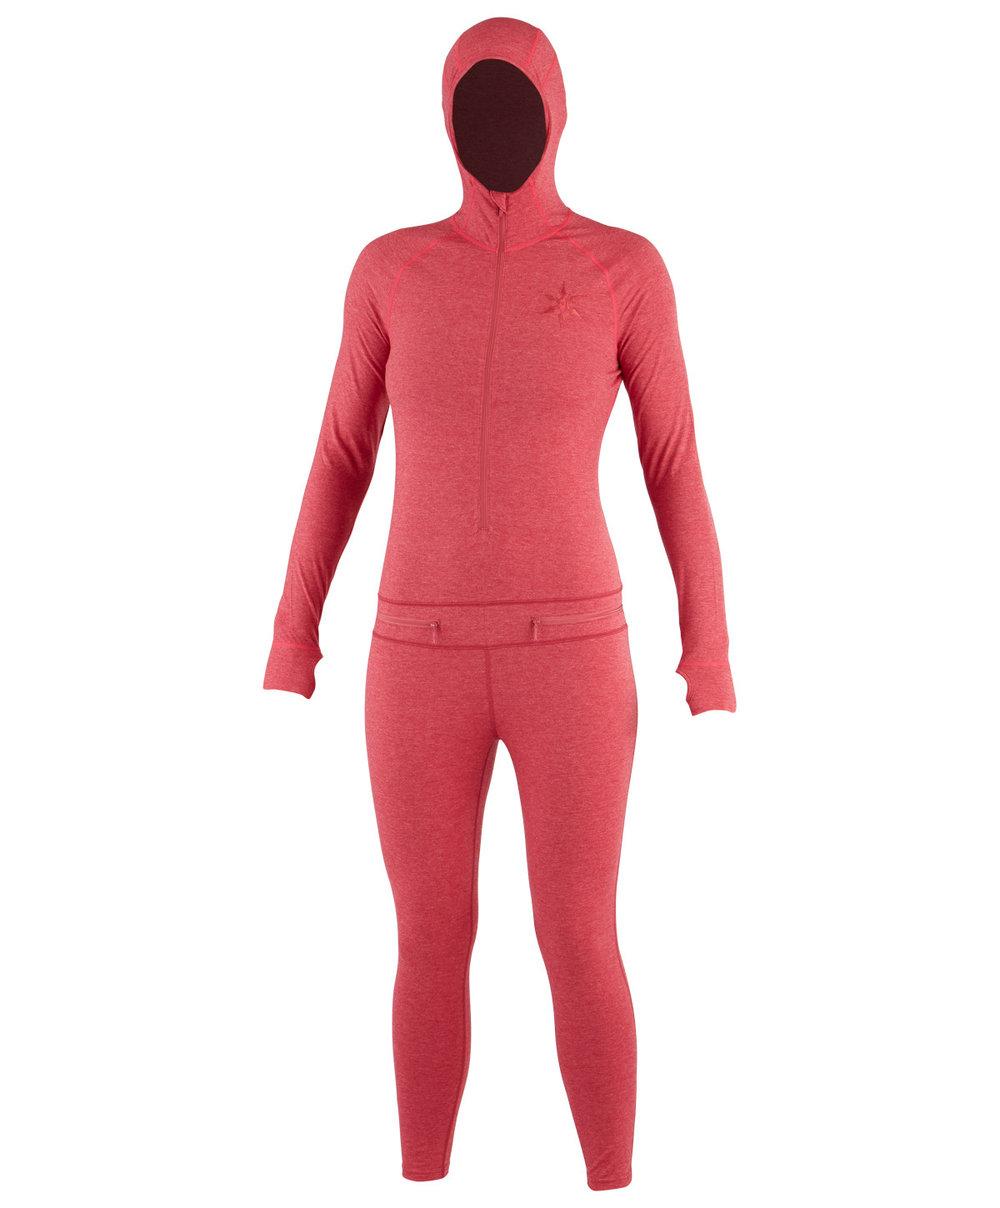 Airblaster - Womens Ninja Suit.jpg